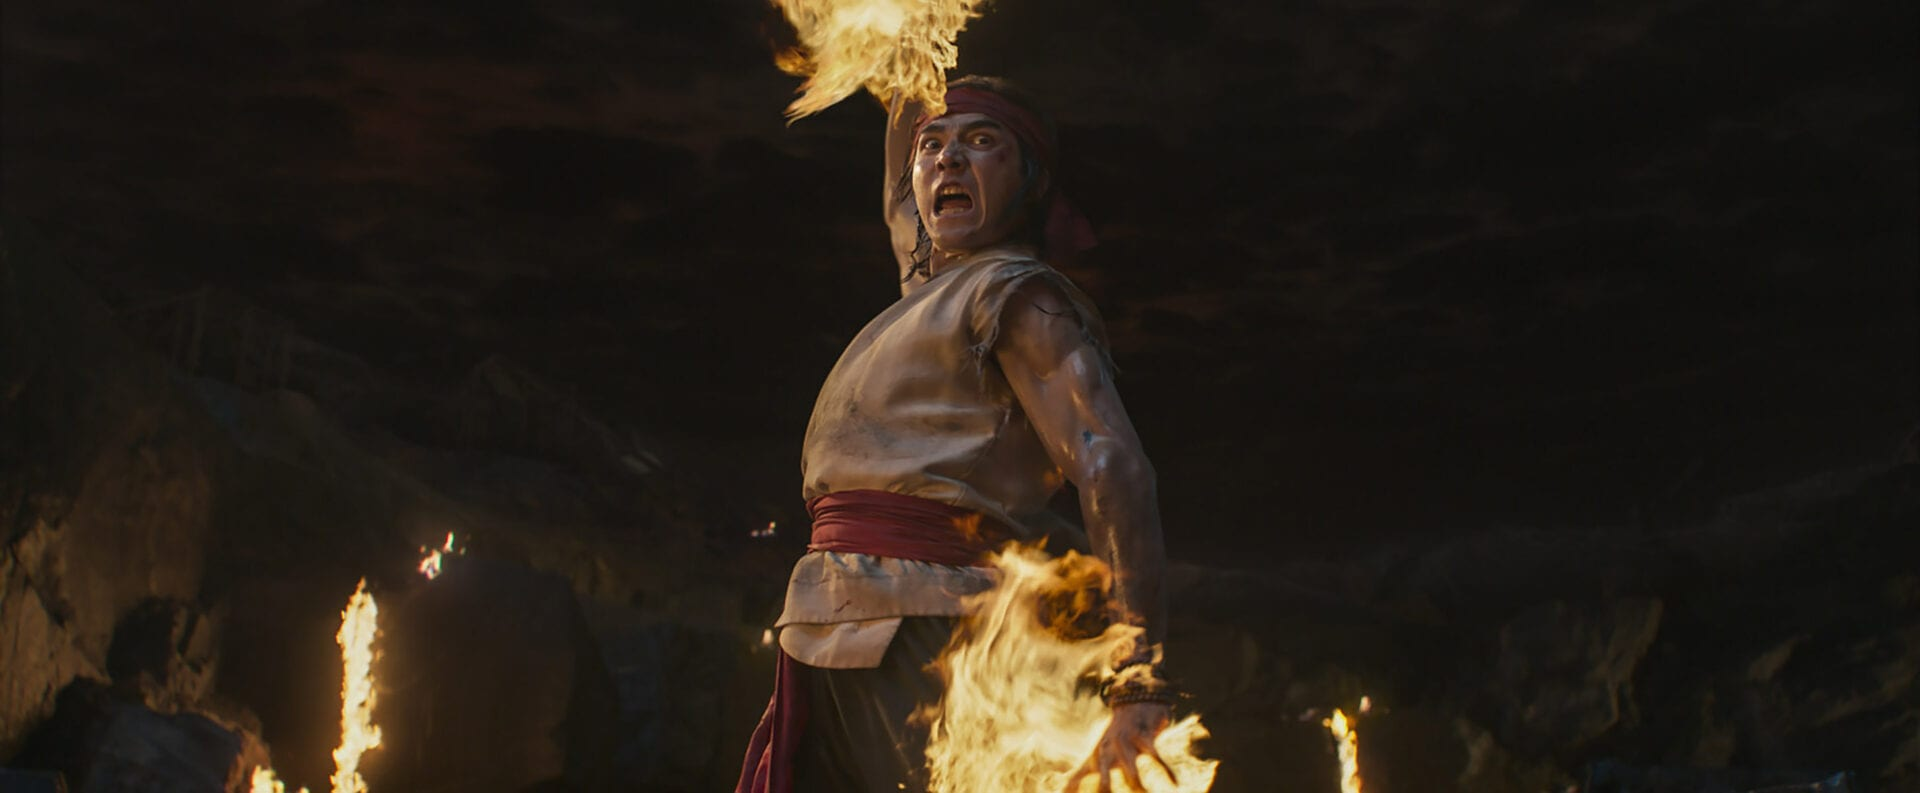 Mortal Kombat Film Trailer Looks Surprisingly Cool